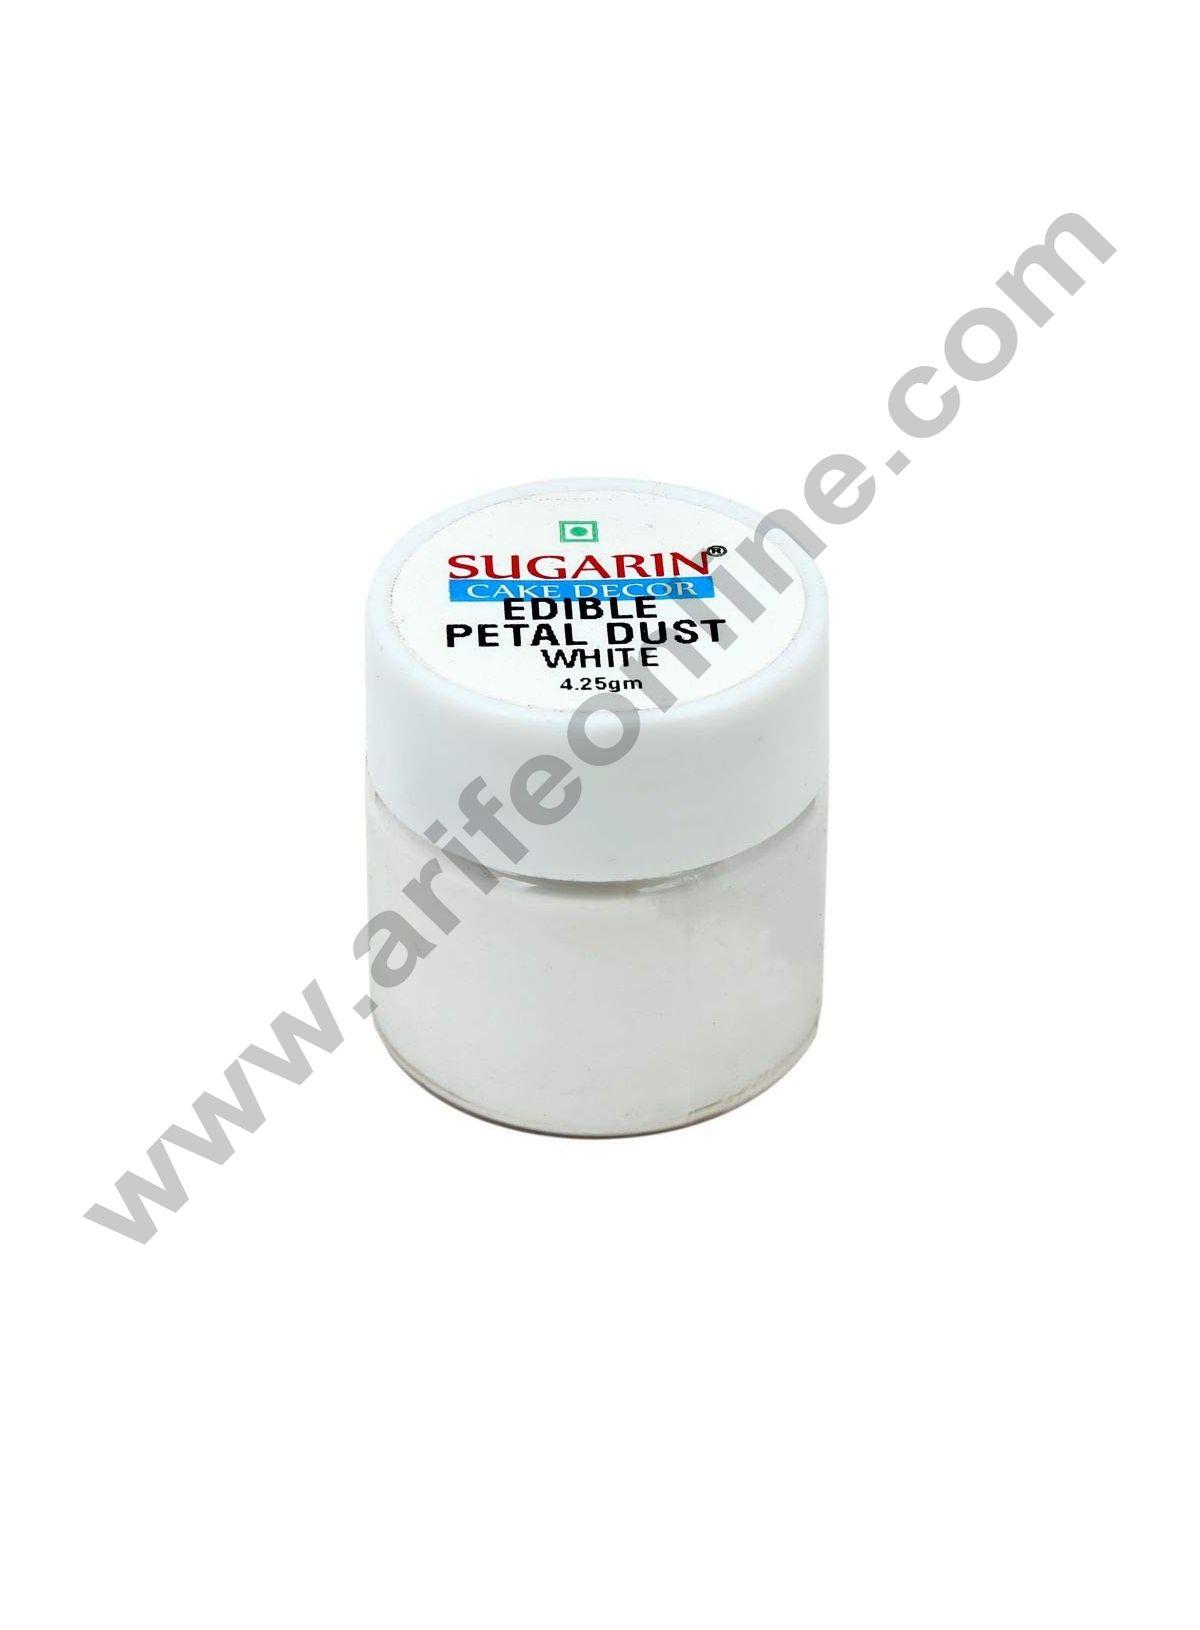 Sugarin Edible Petal Dust, White, 4.25gm